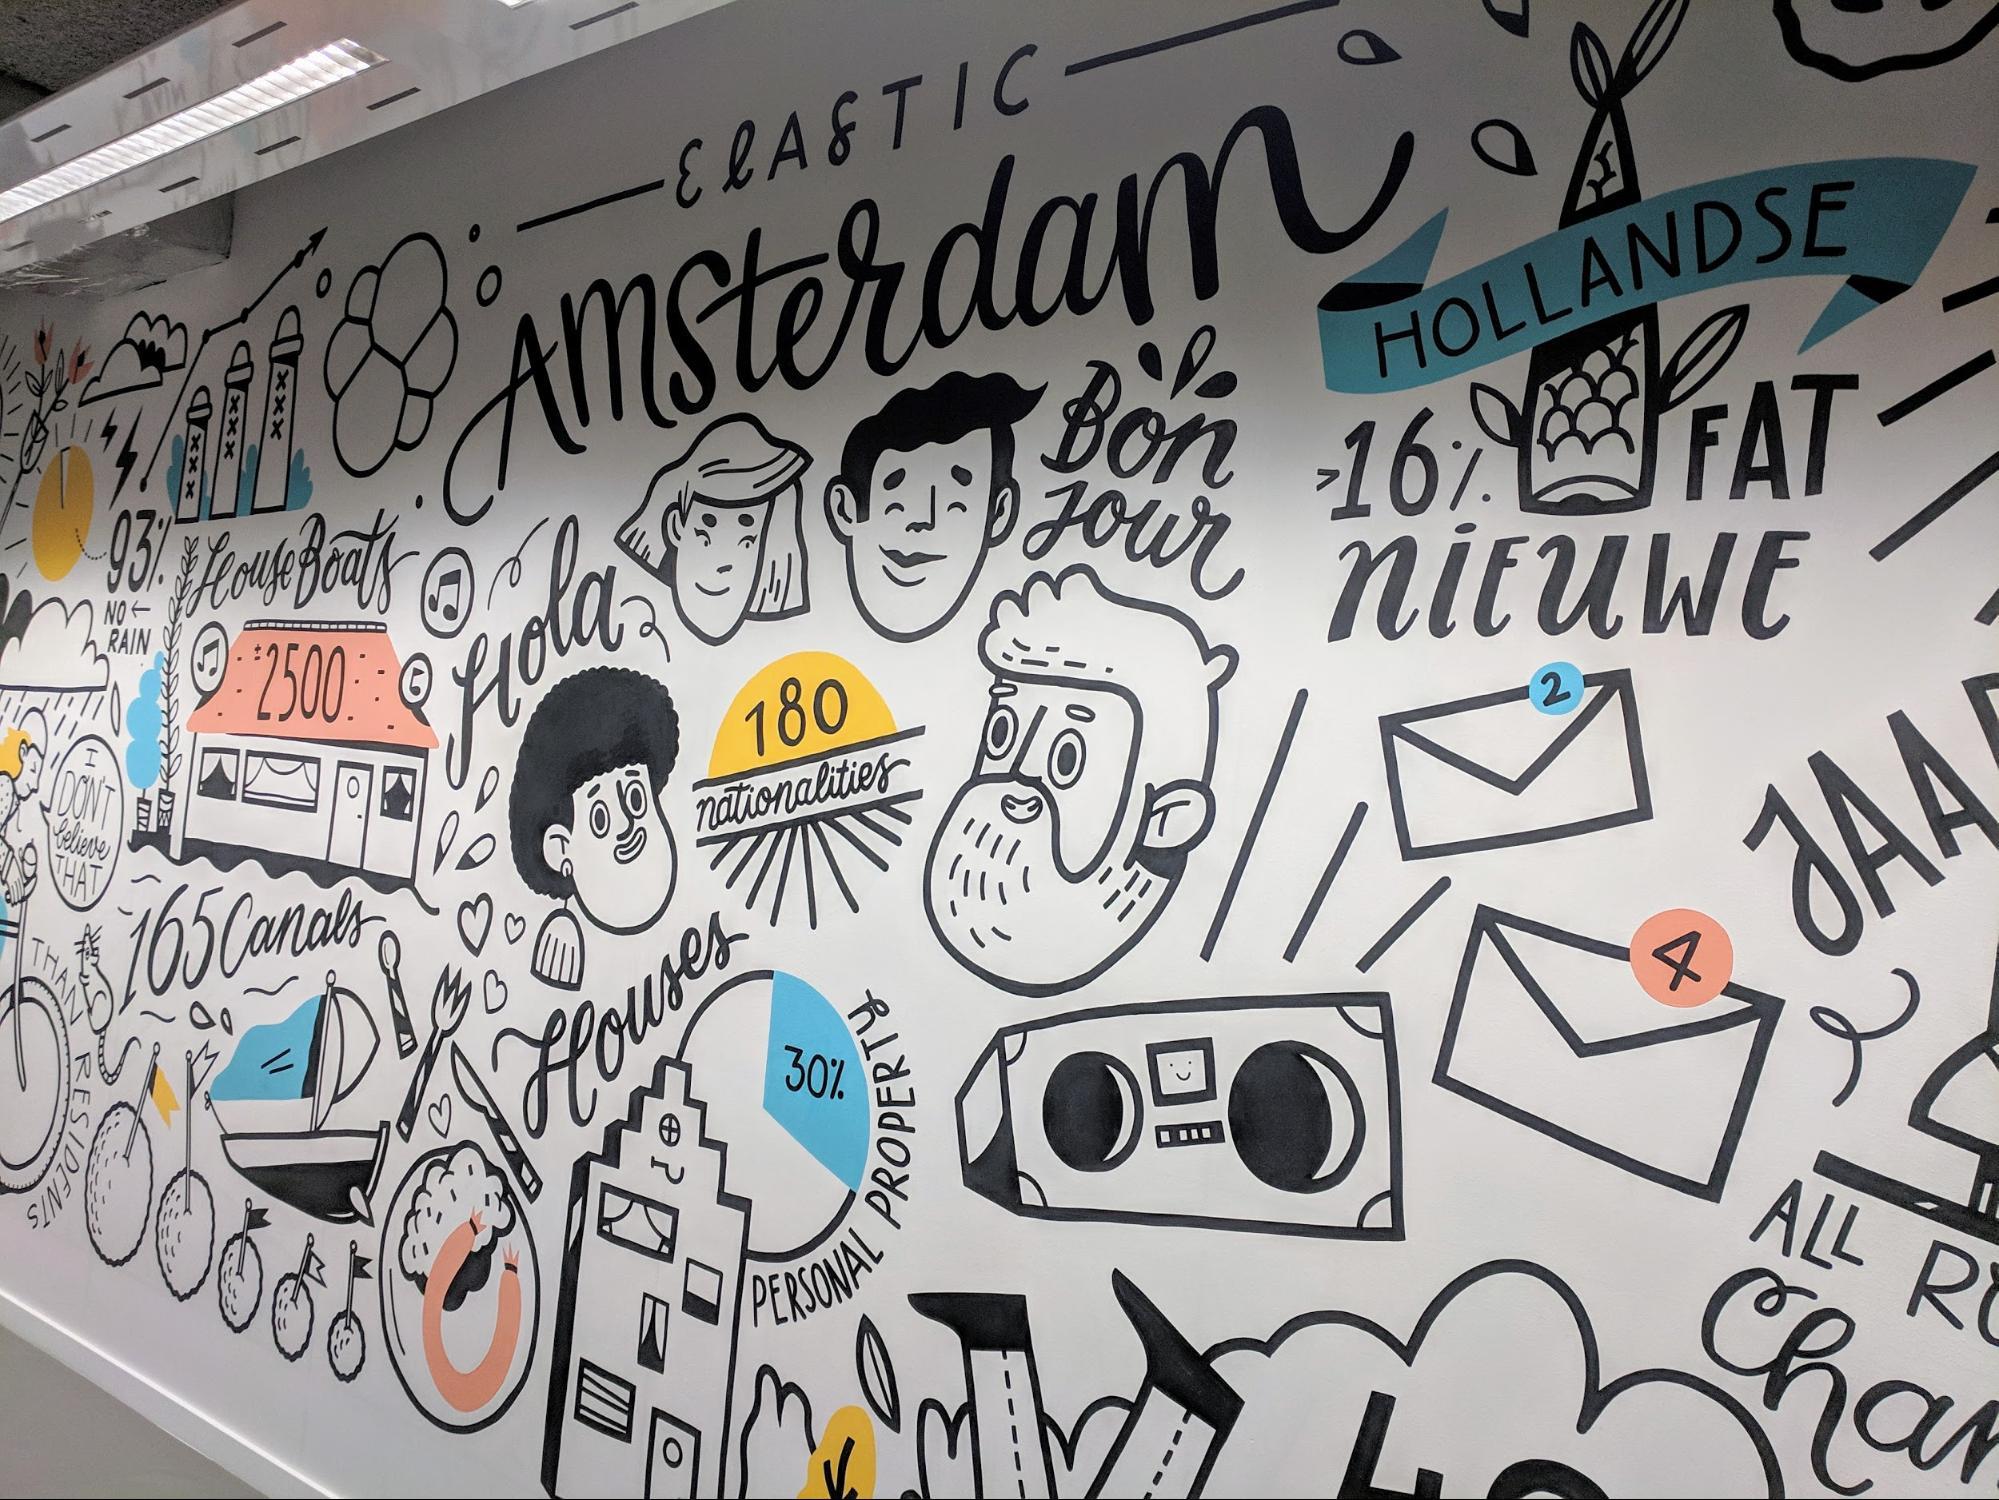 Amsterdam culture wall.jpg